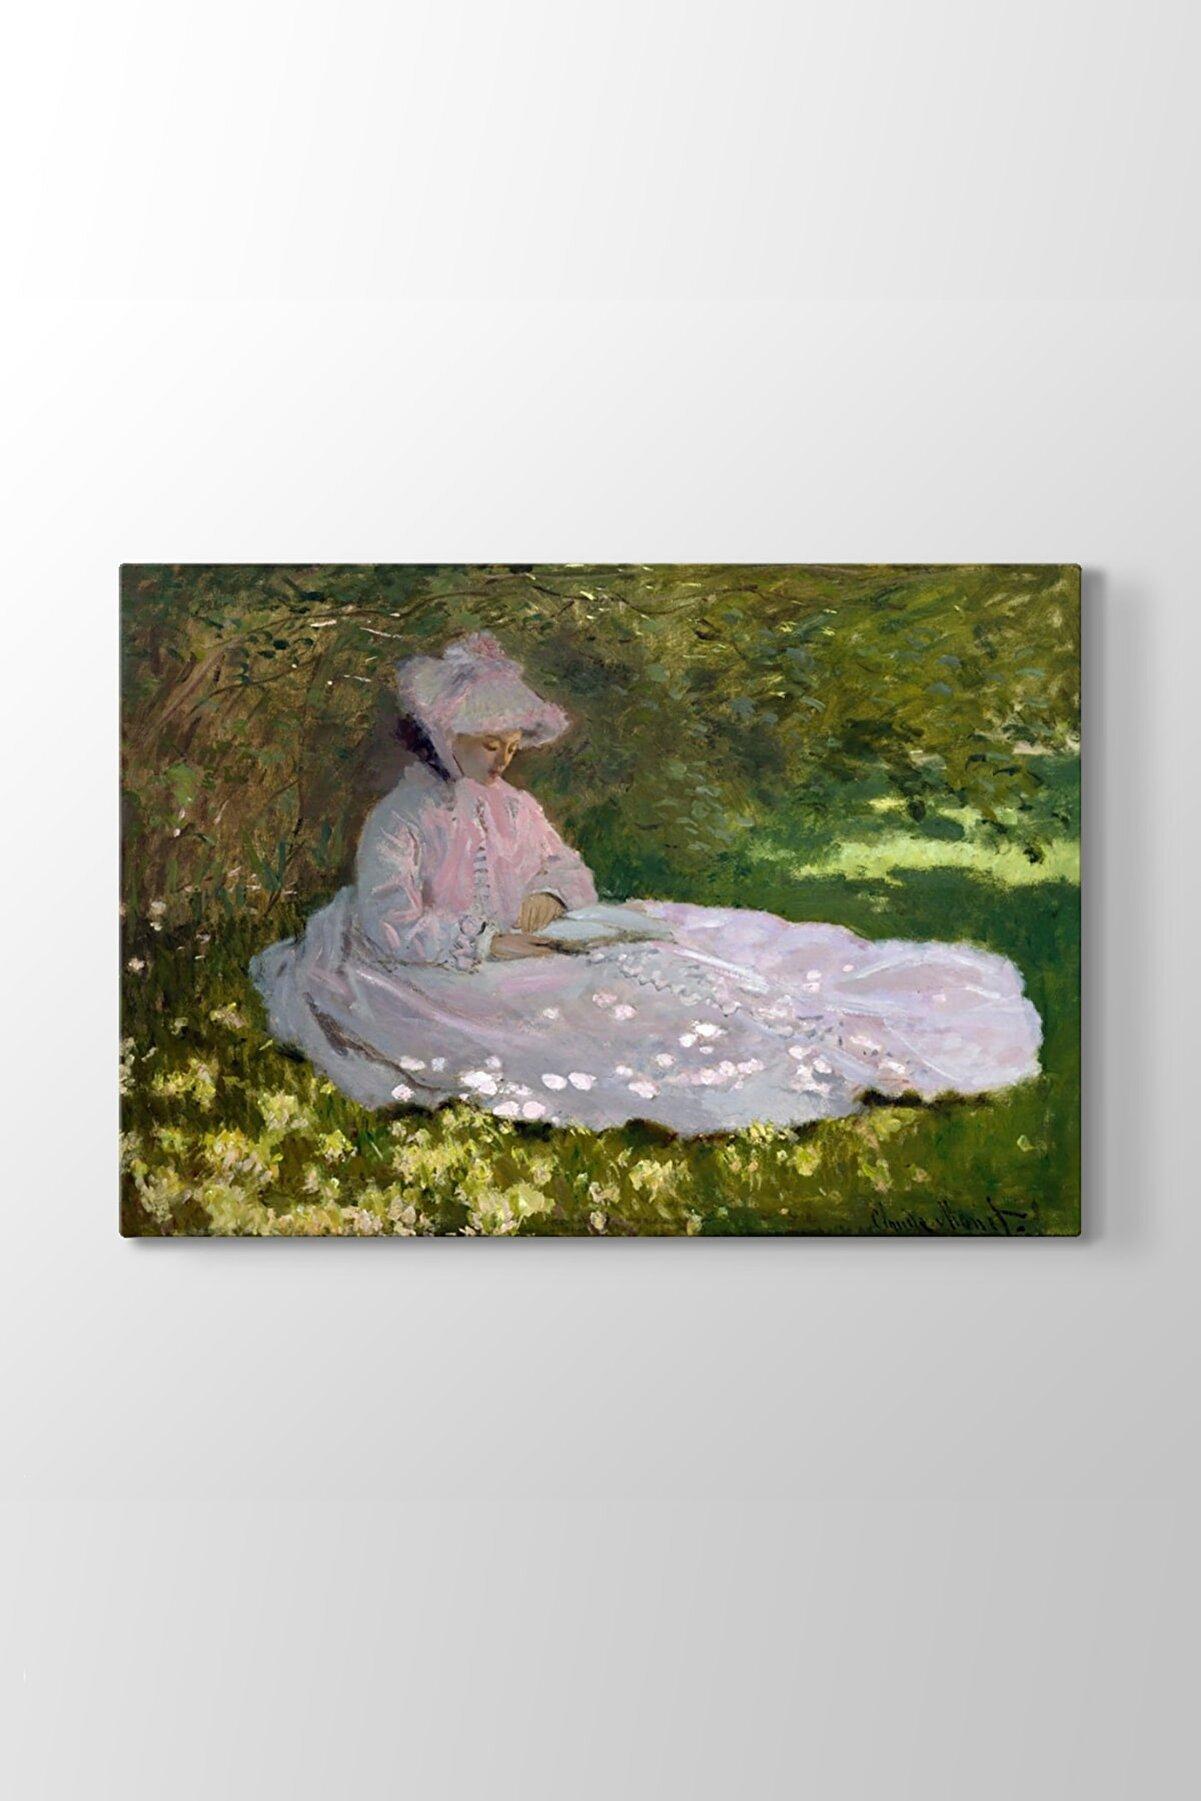 TabloShop Claude Monet - Springtime Tablosu (Model 1) - (ÖLÇÜSÜ 45x30 cm)